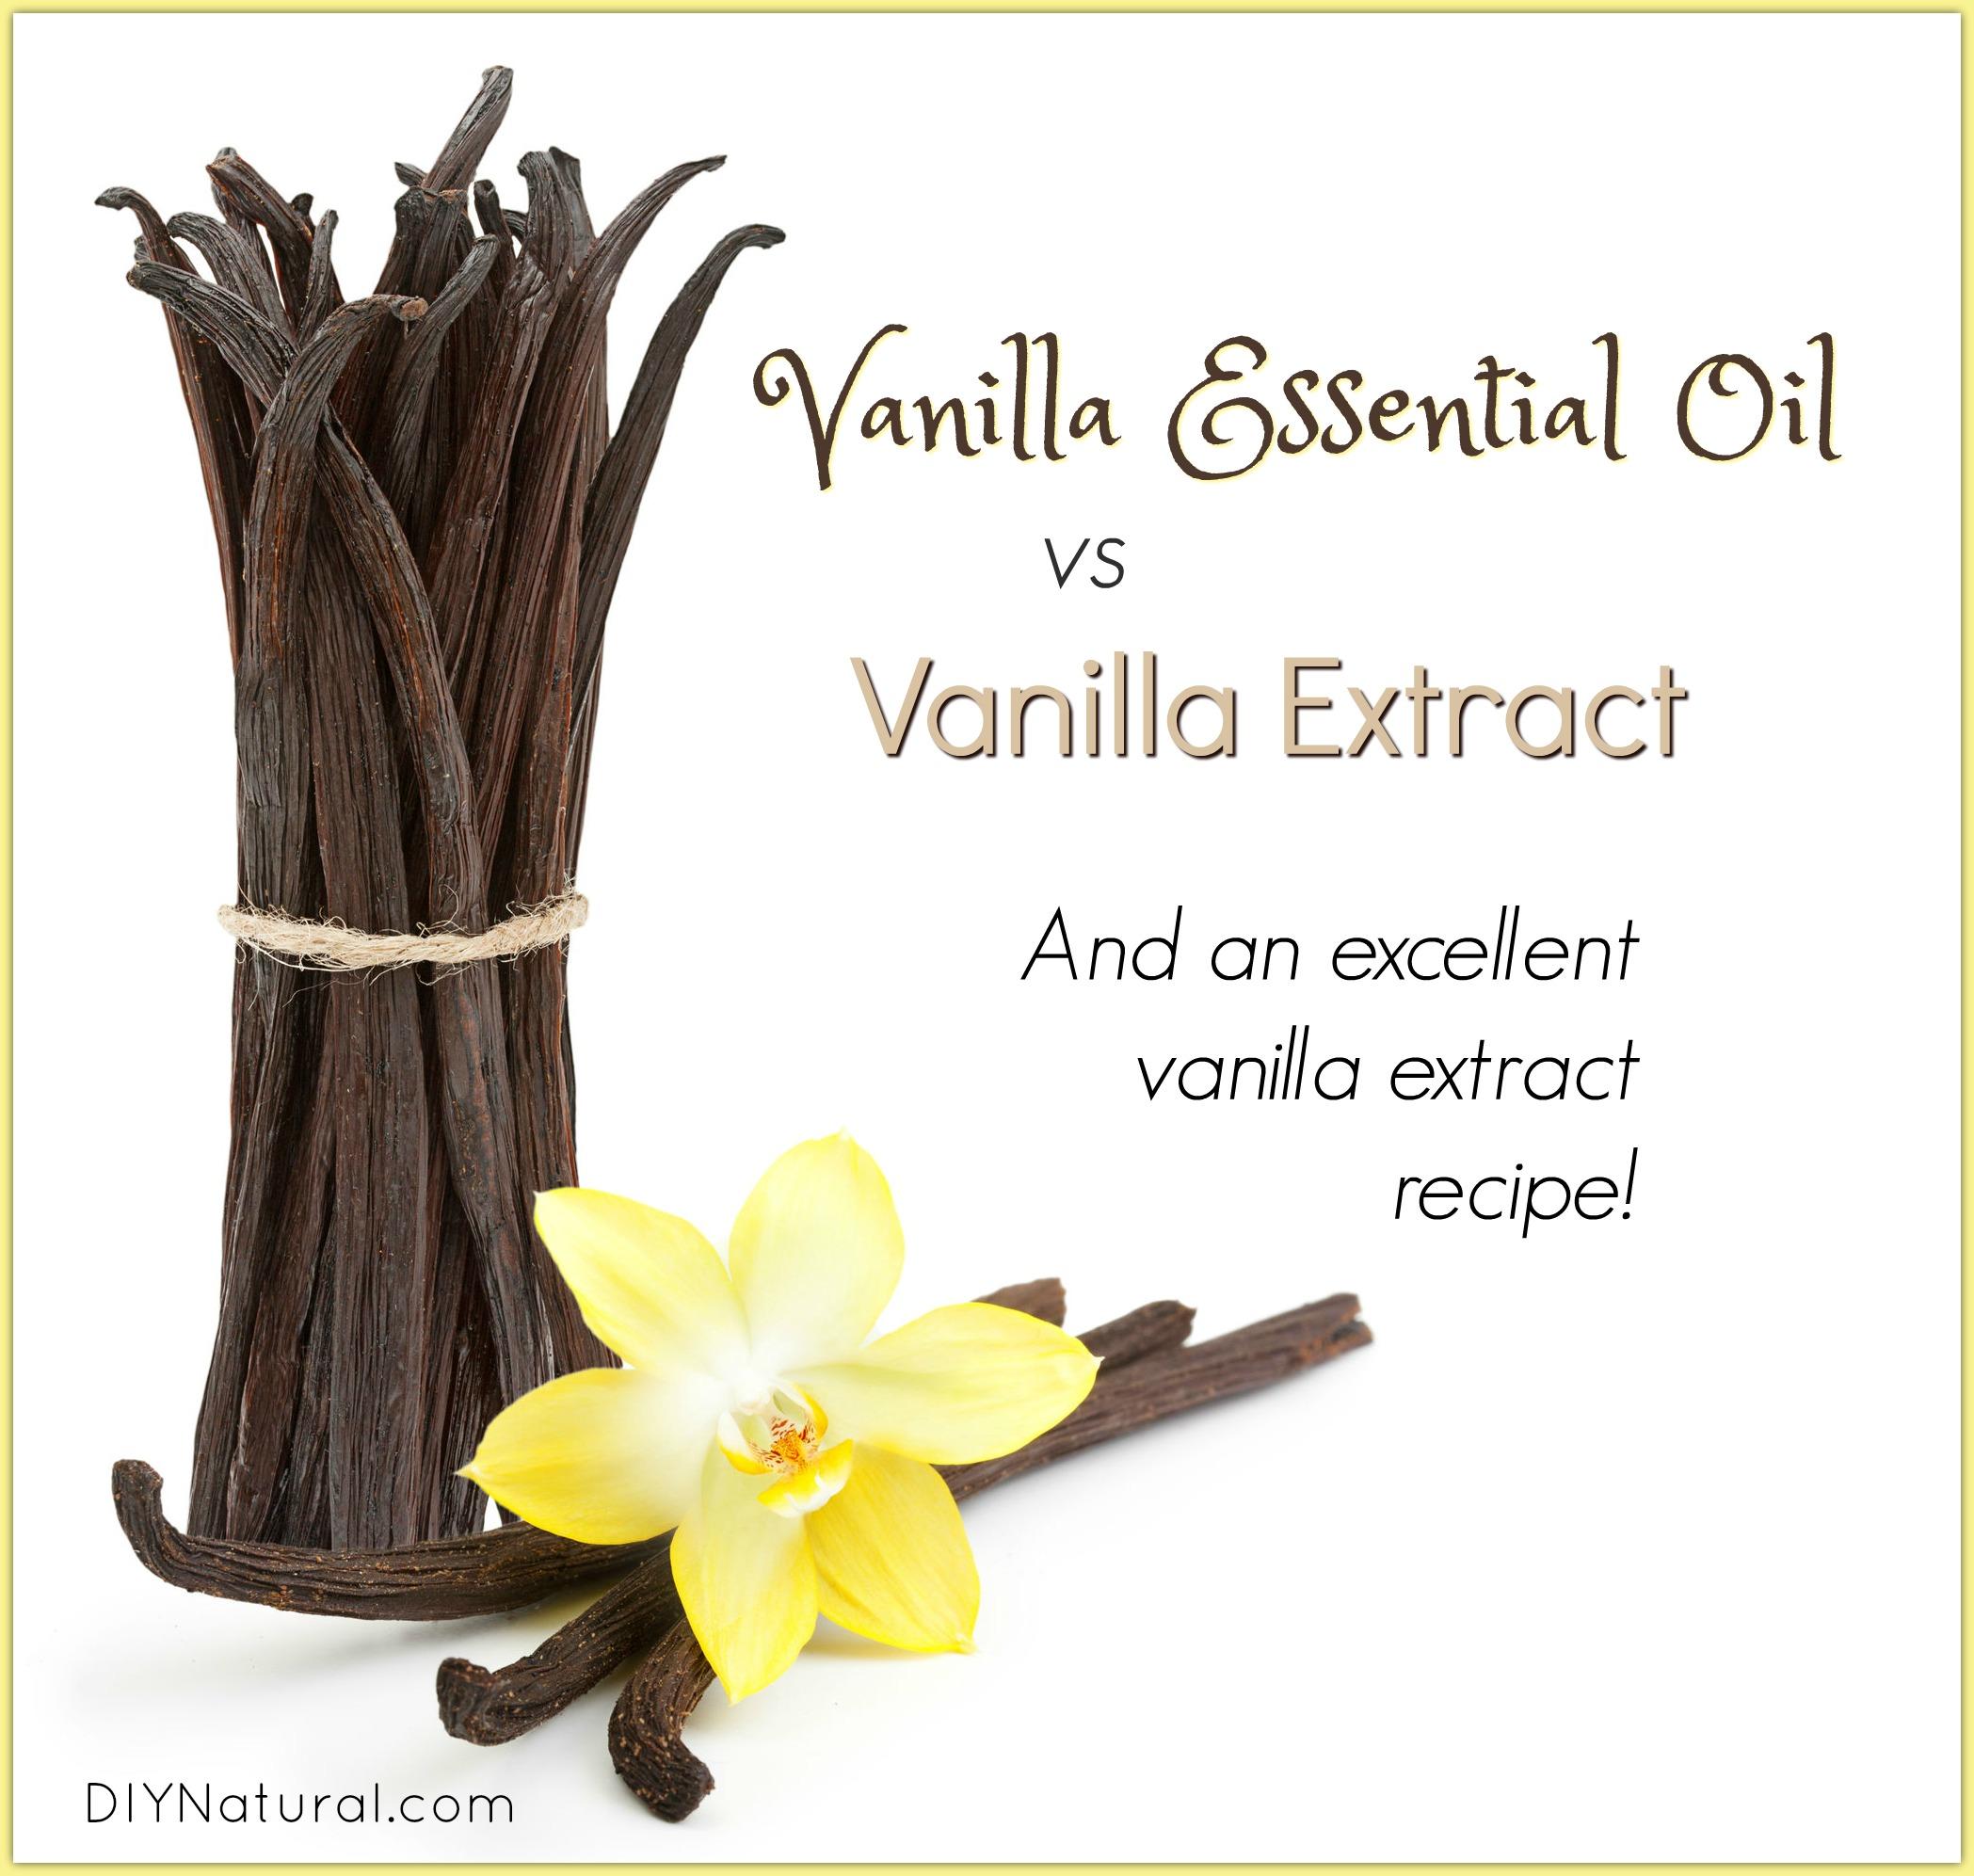 Vanilla Essential Oil Vs Vanilla Extract And Little Known Health Uses For Vanilla